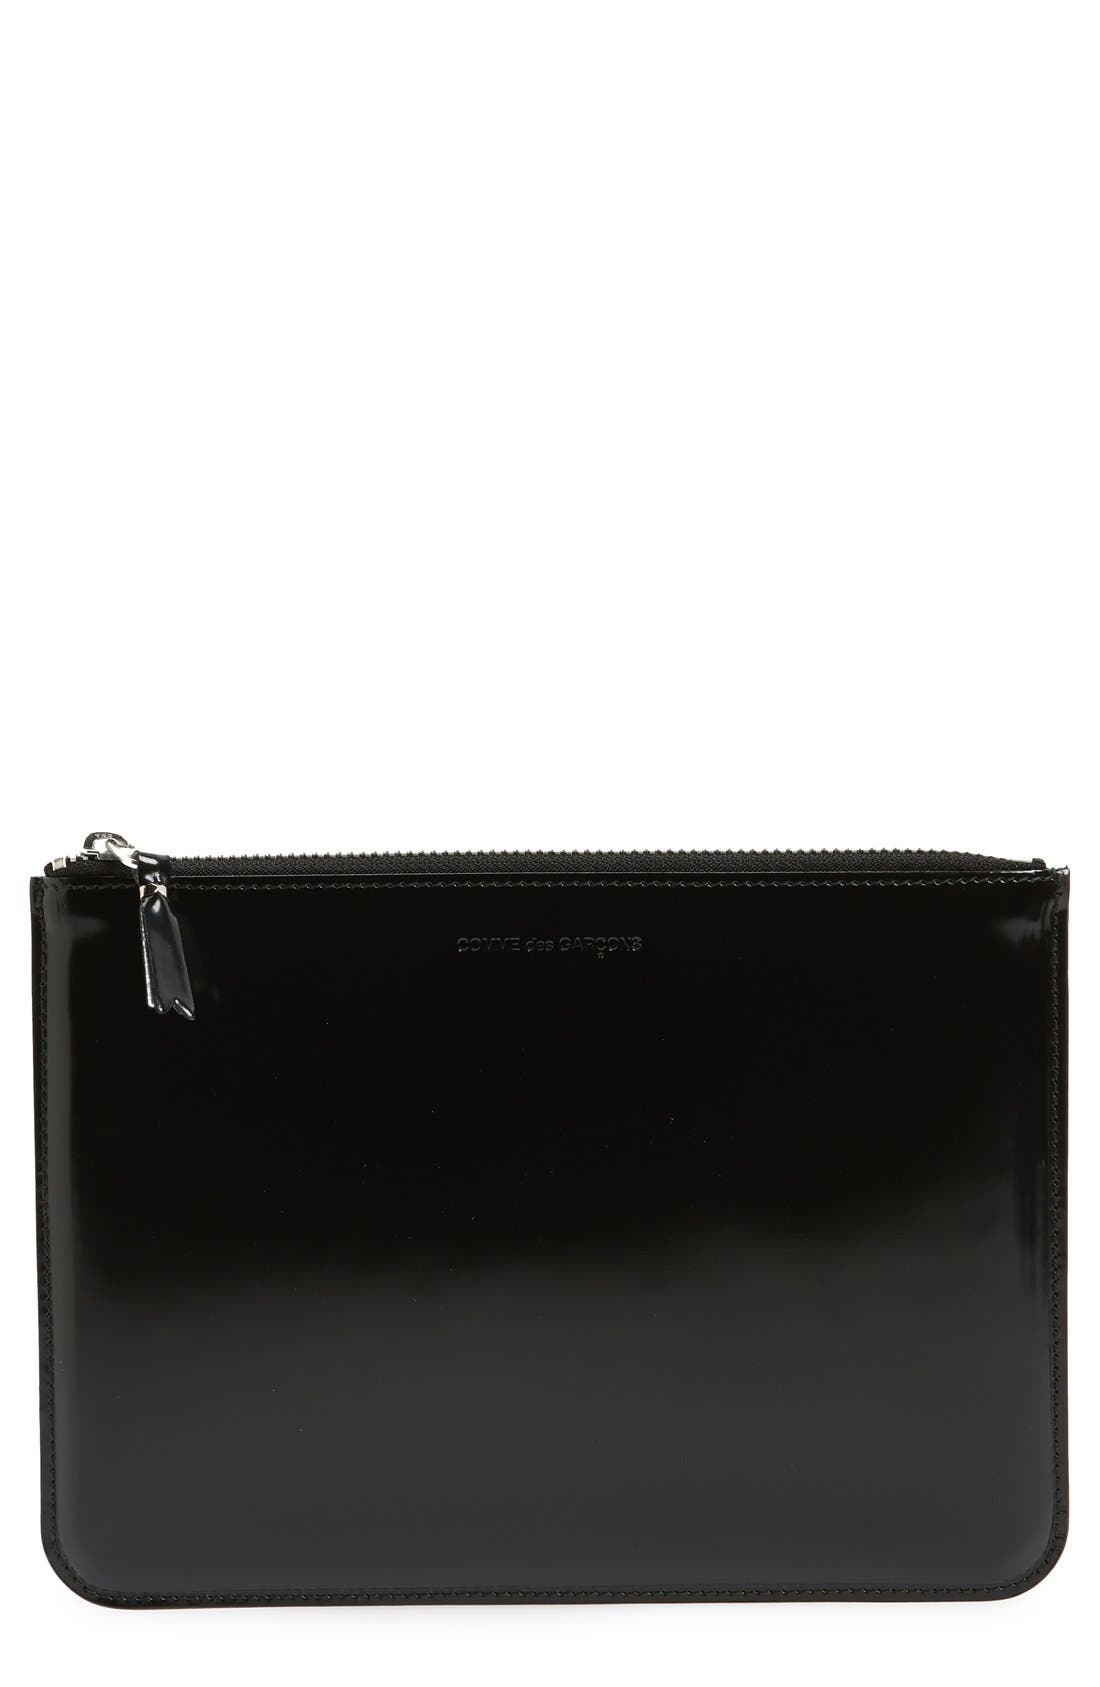 Alternate Image 1 Selected - Comme des Garçons Large Top Zip Leather Pouch